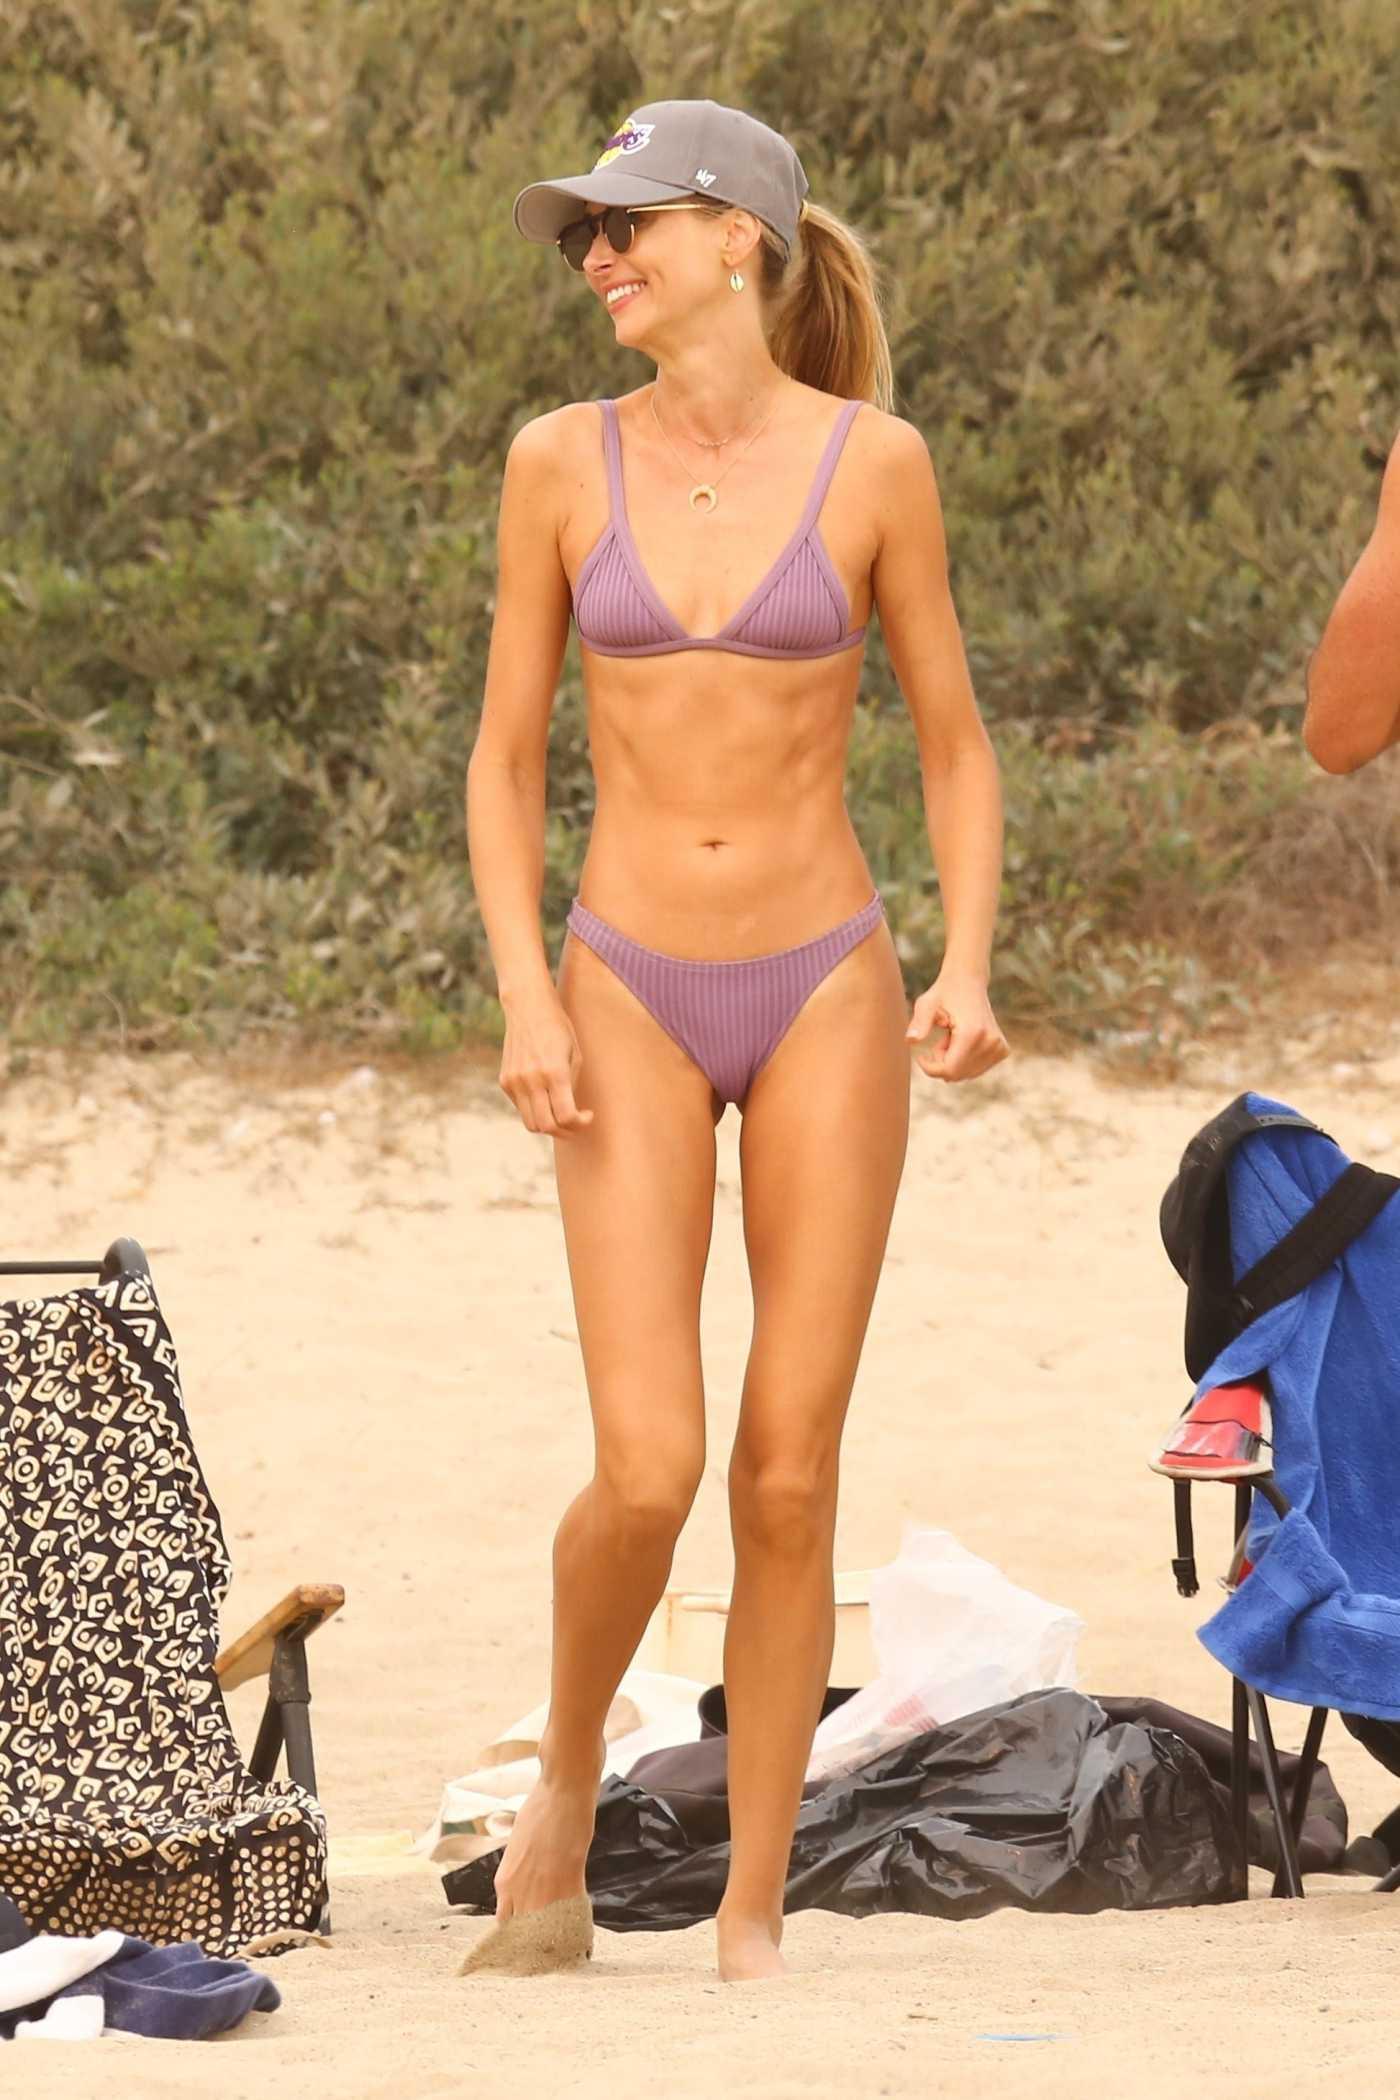 Ludi Delfino in a Purple Bikini on the Beach in Malibu 09/13/2020